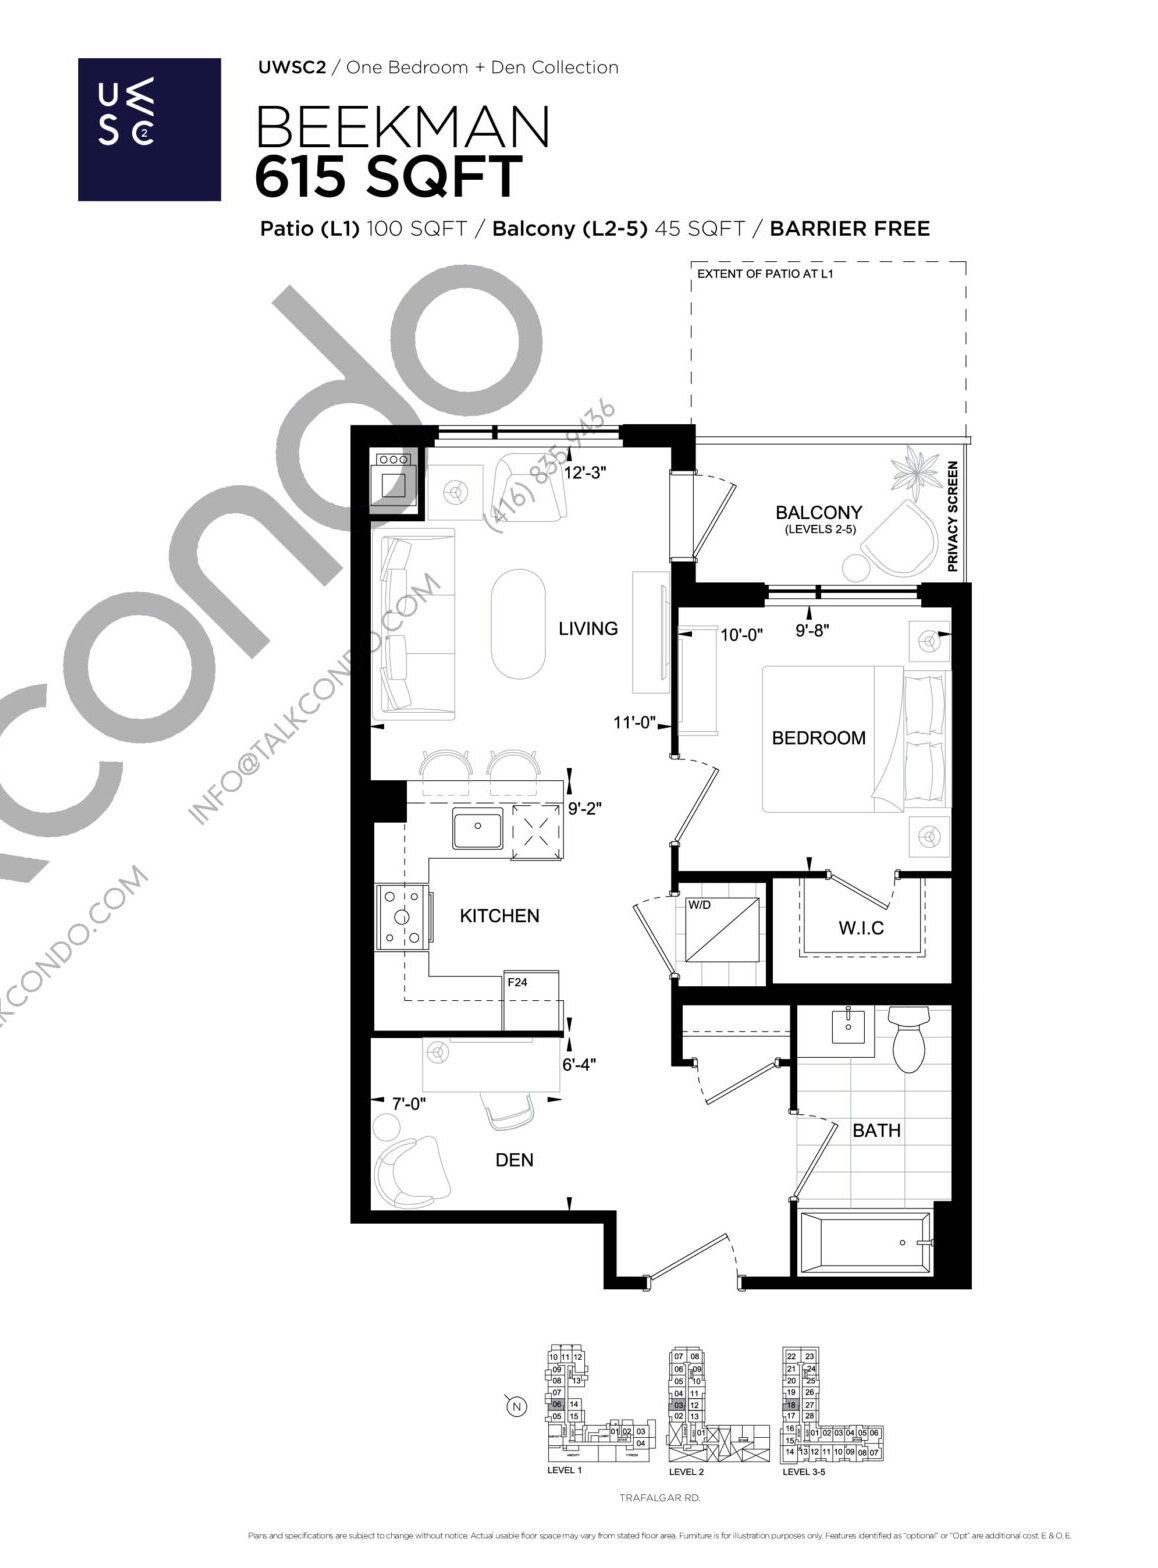 Beekman Floor Plan at Upper West Side Condos 2 - 615 sq.ft